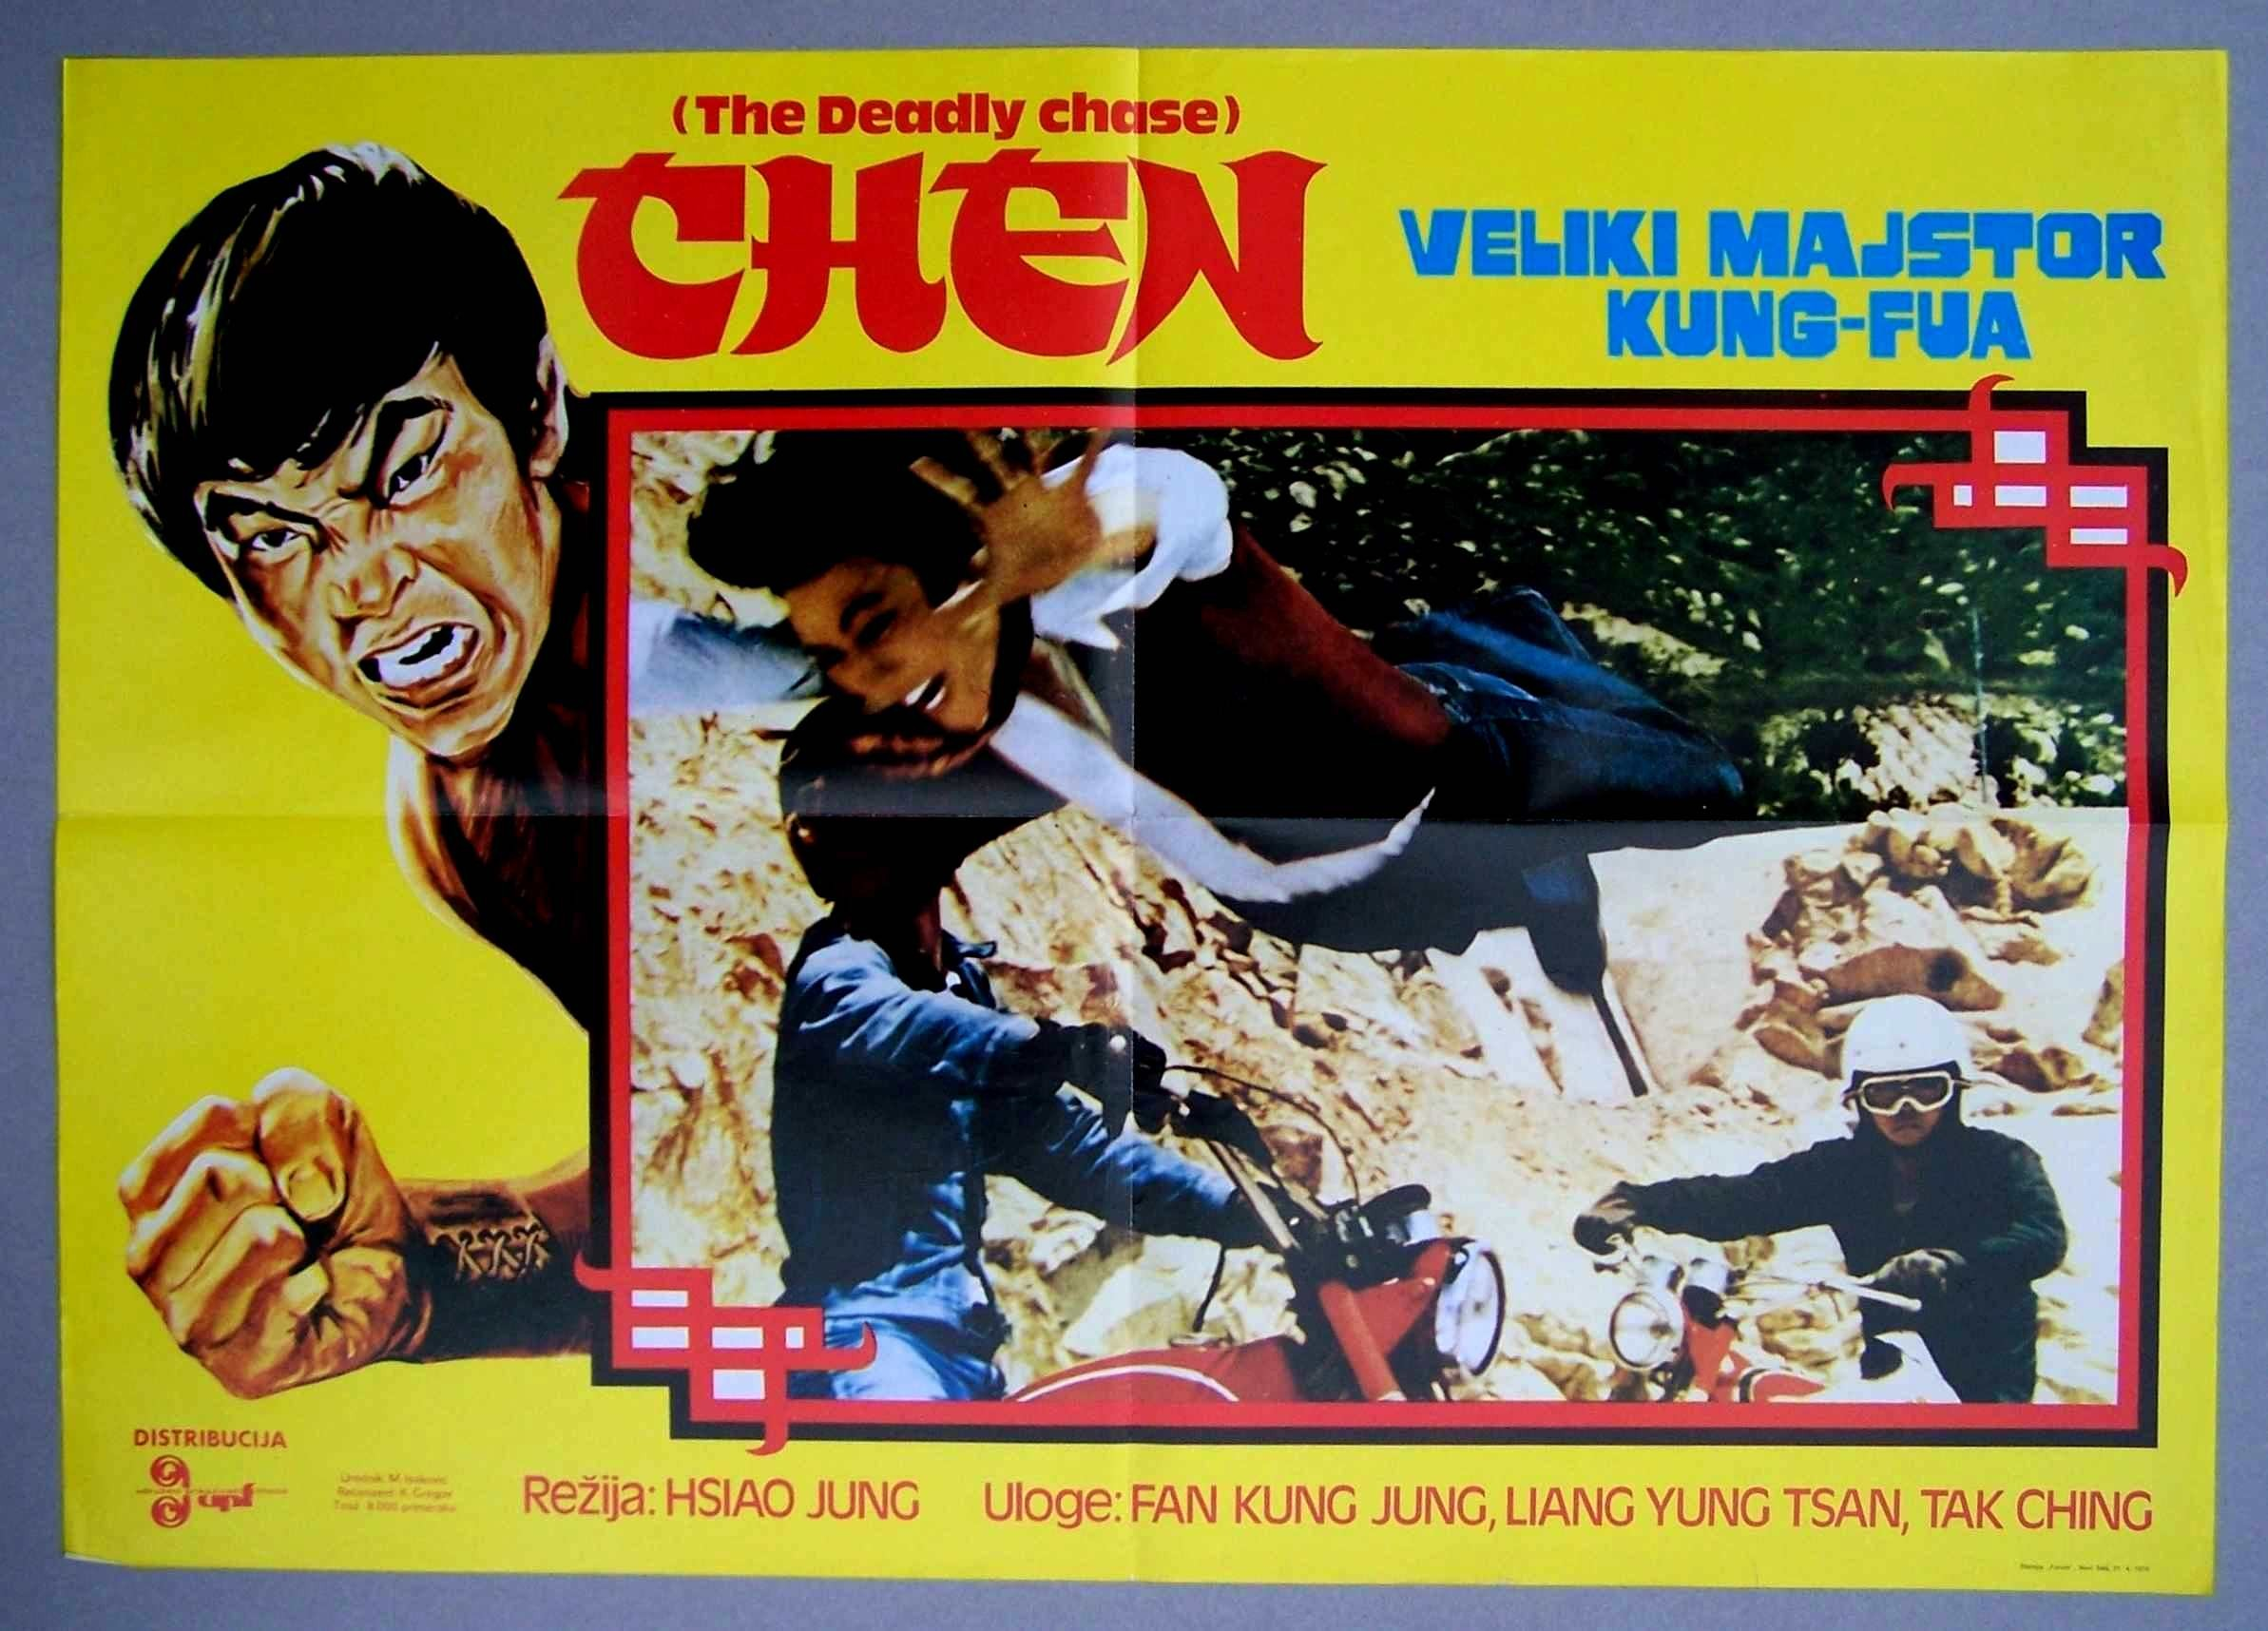 Chen Veliki Majstor Kung-Fua